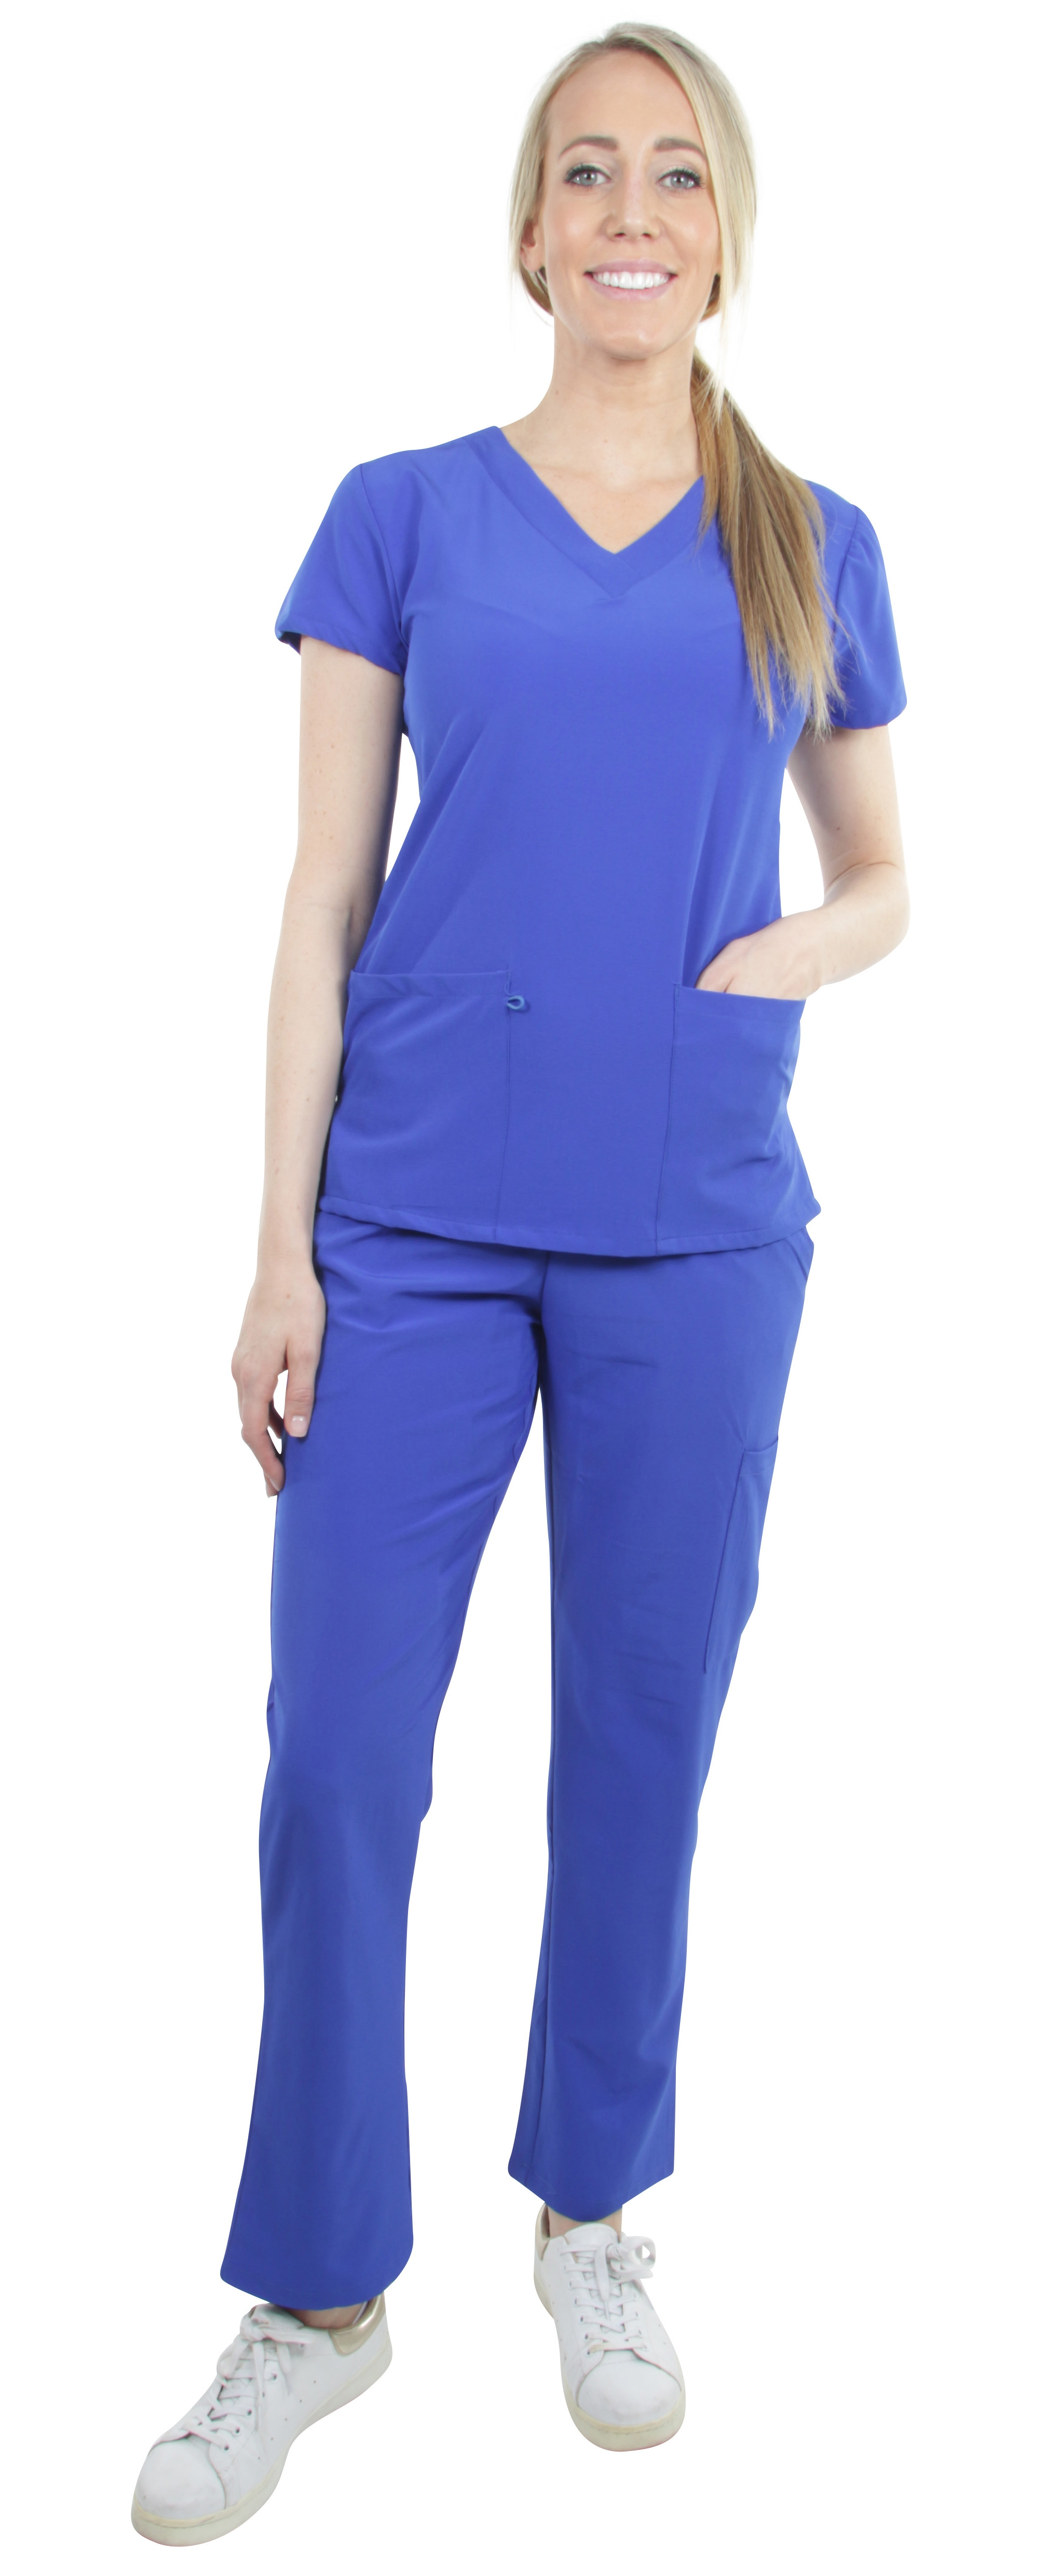 Unisex-Performance-Stretch-Medical-Uniform-Five-Pockets-V-Neck-Scrubs-Sets miniature 24